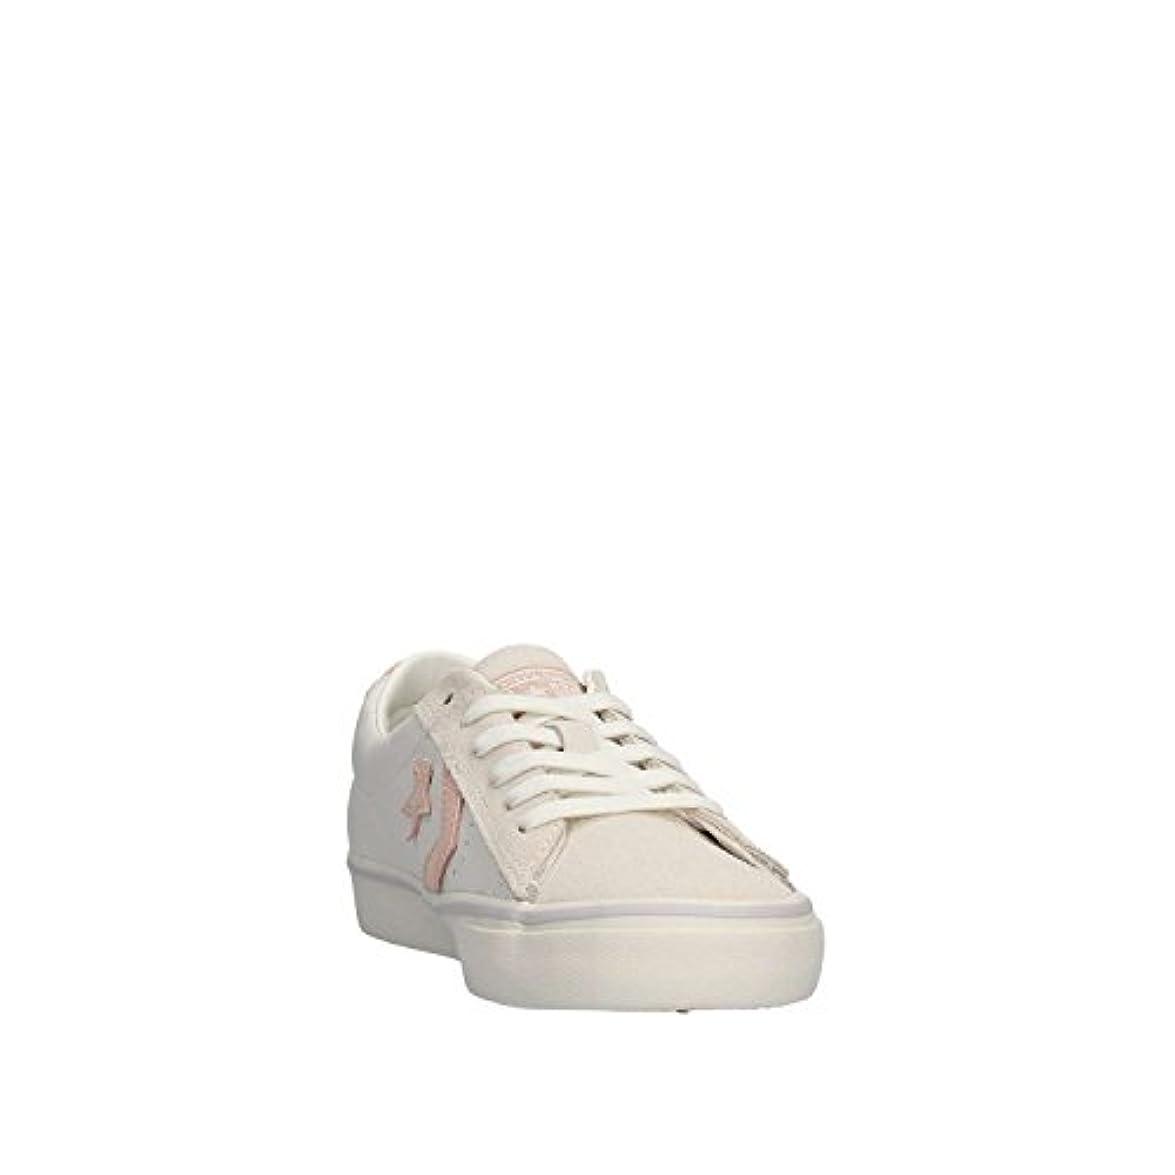 Converse Vulc Ox - Sneakers Basse Bianco rosa